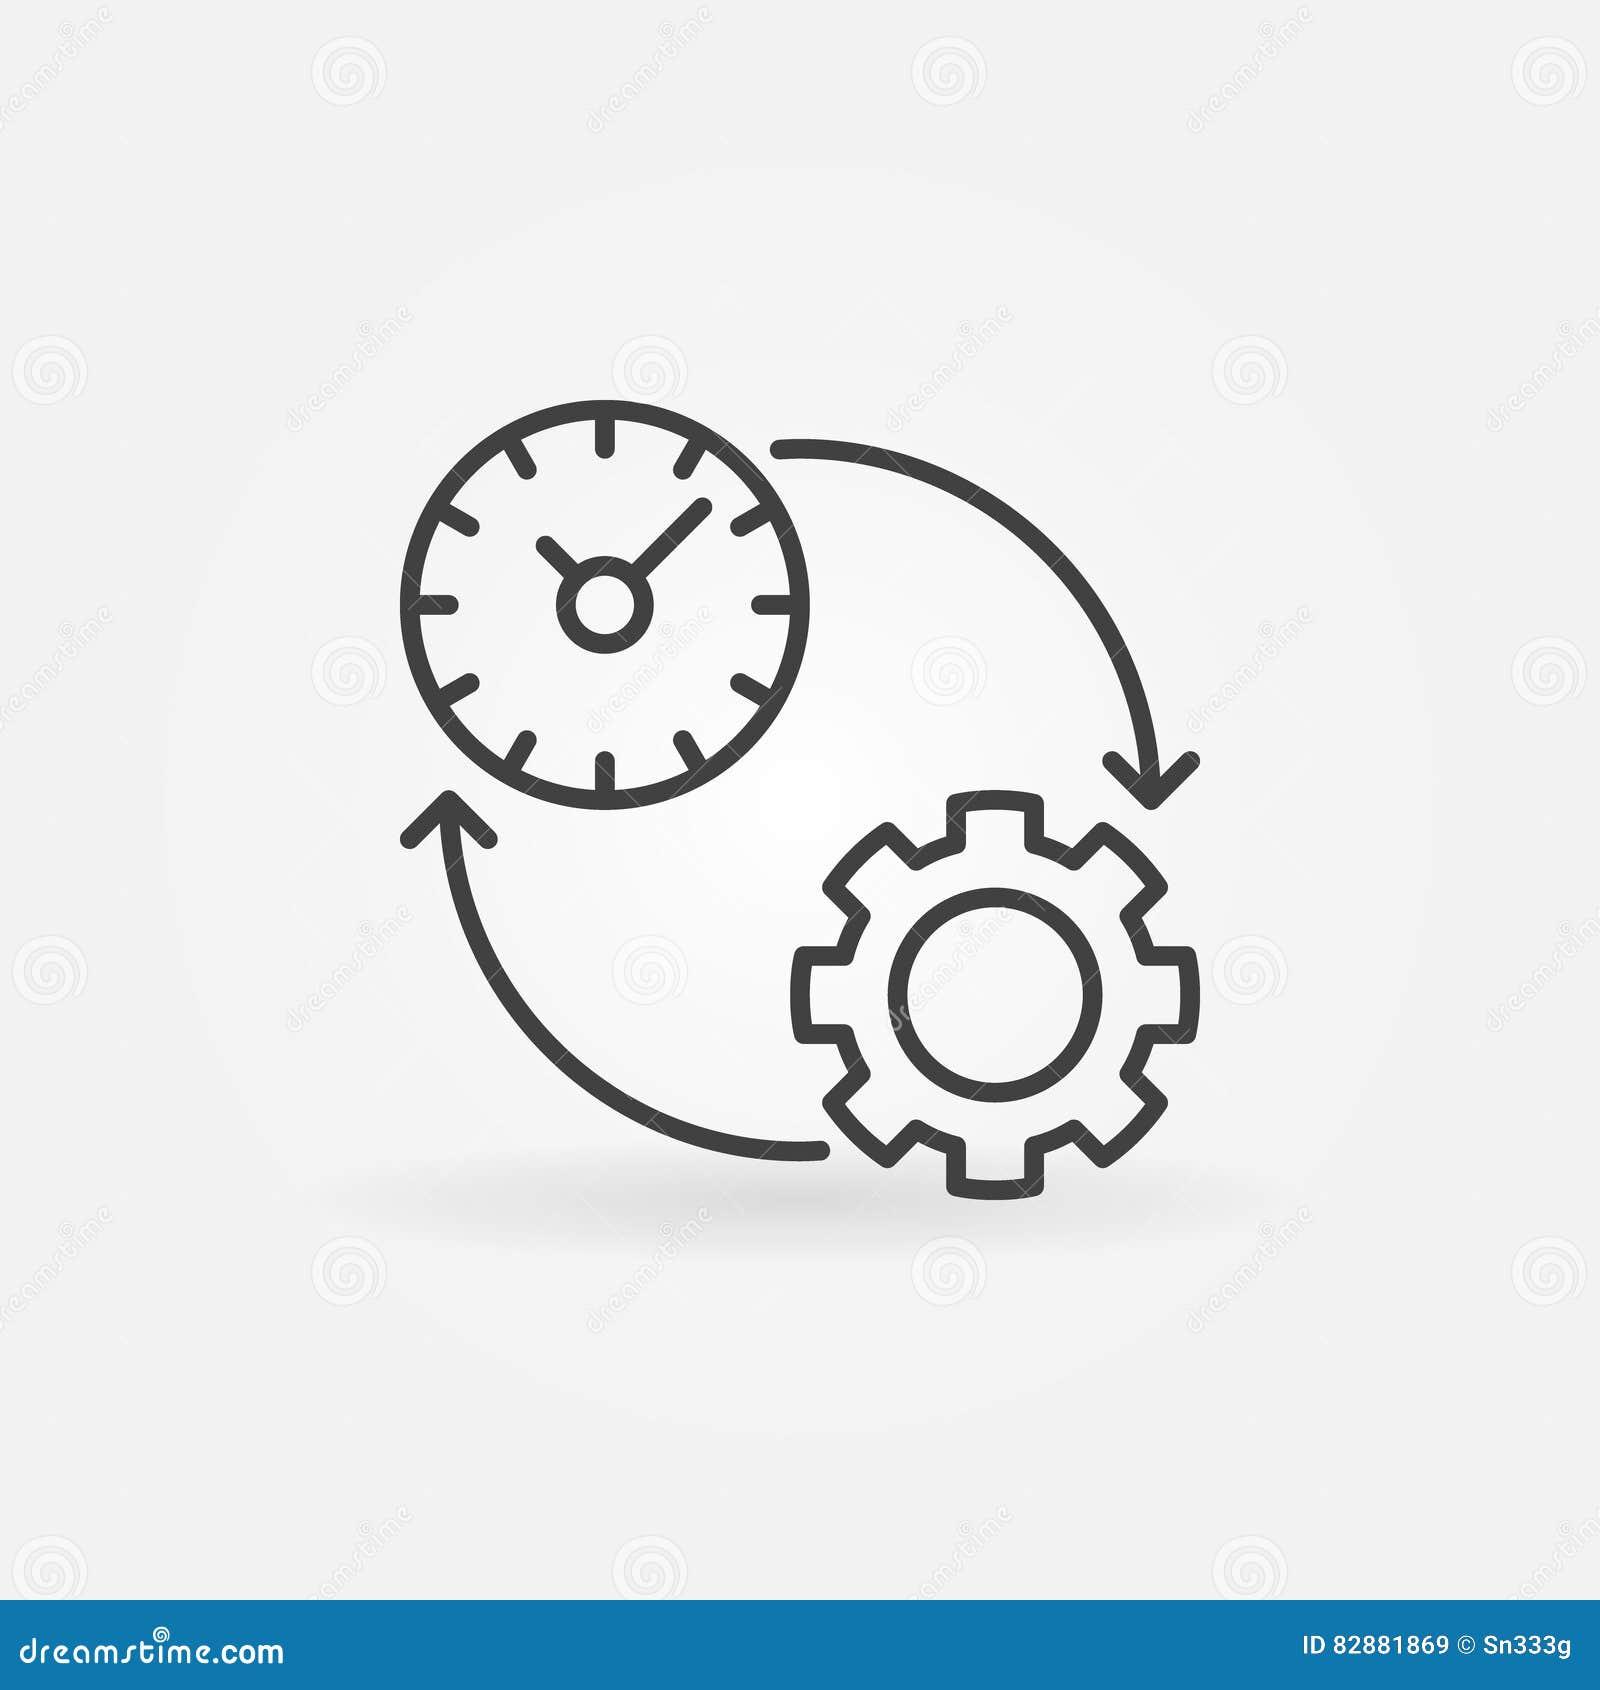 Productivity line icon